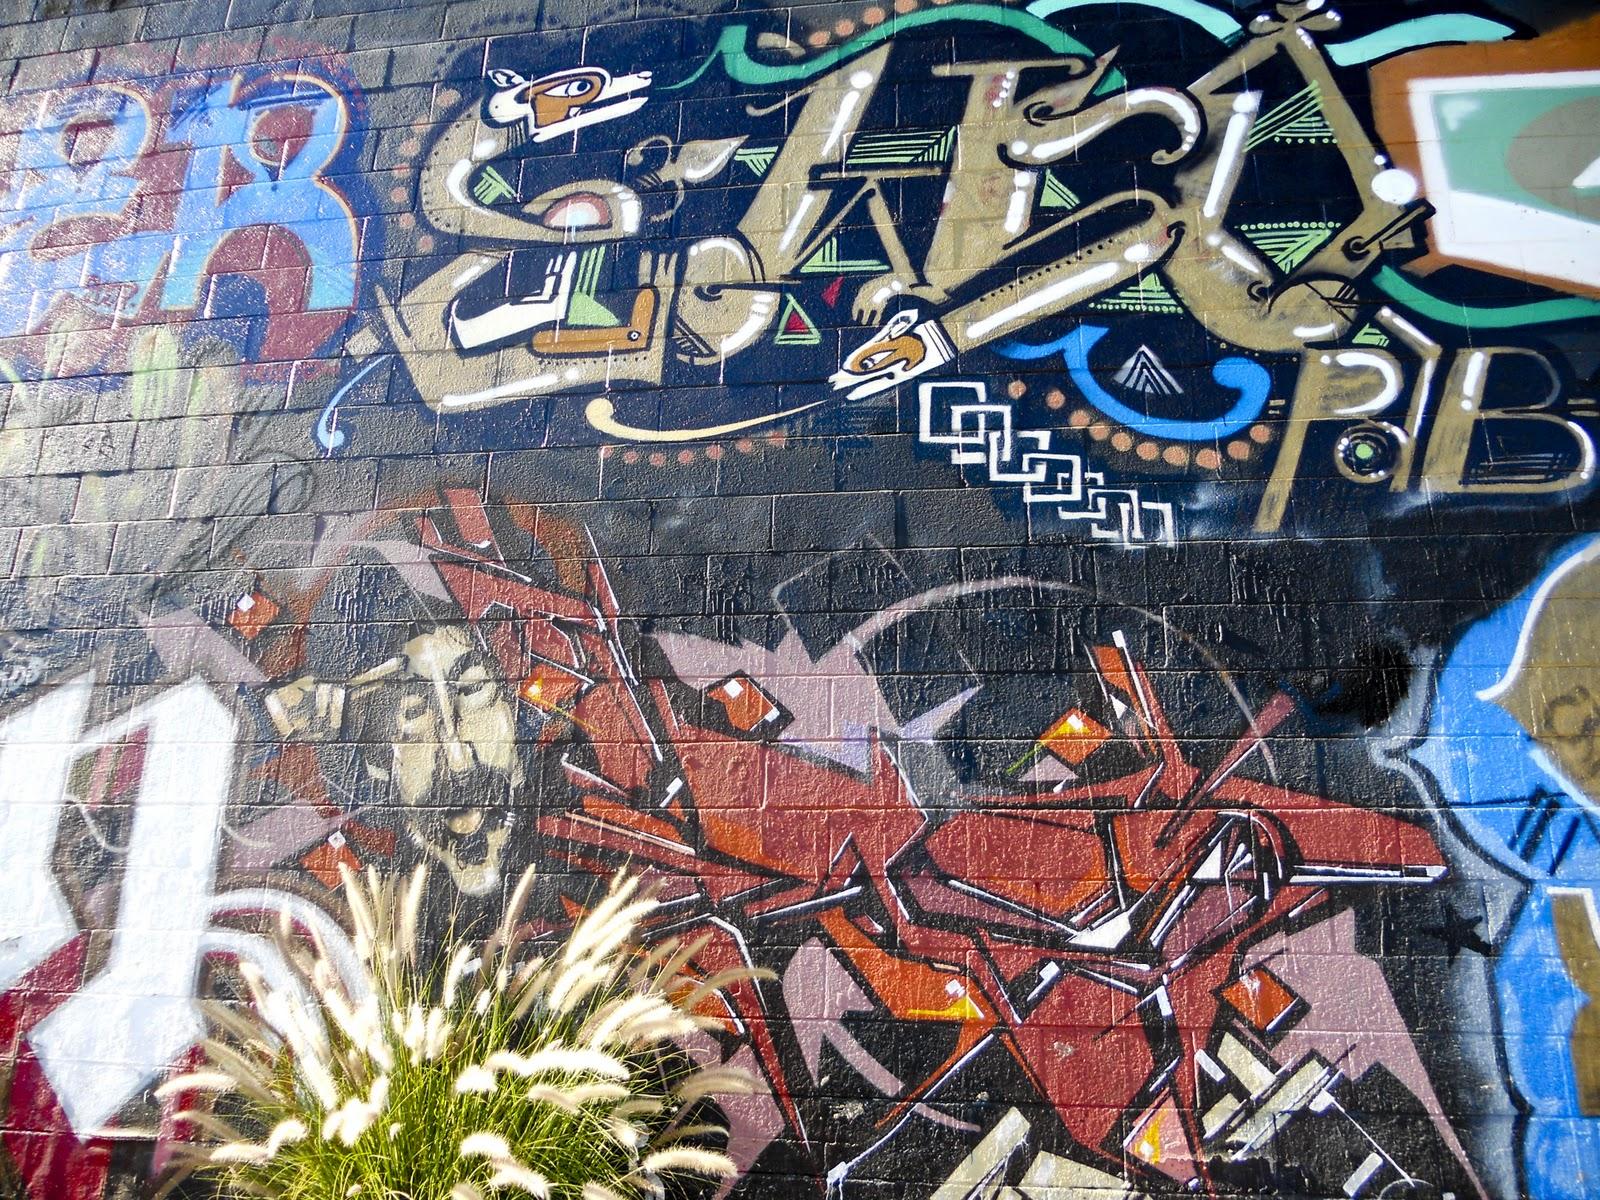 Tagging And Graffiti In Arcadia